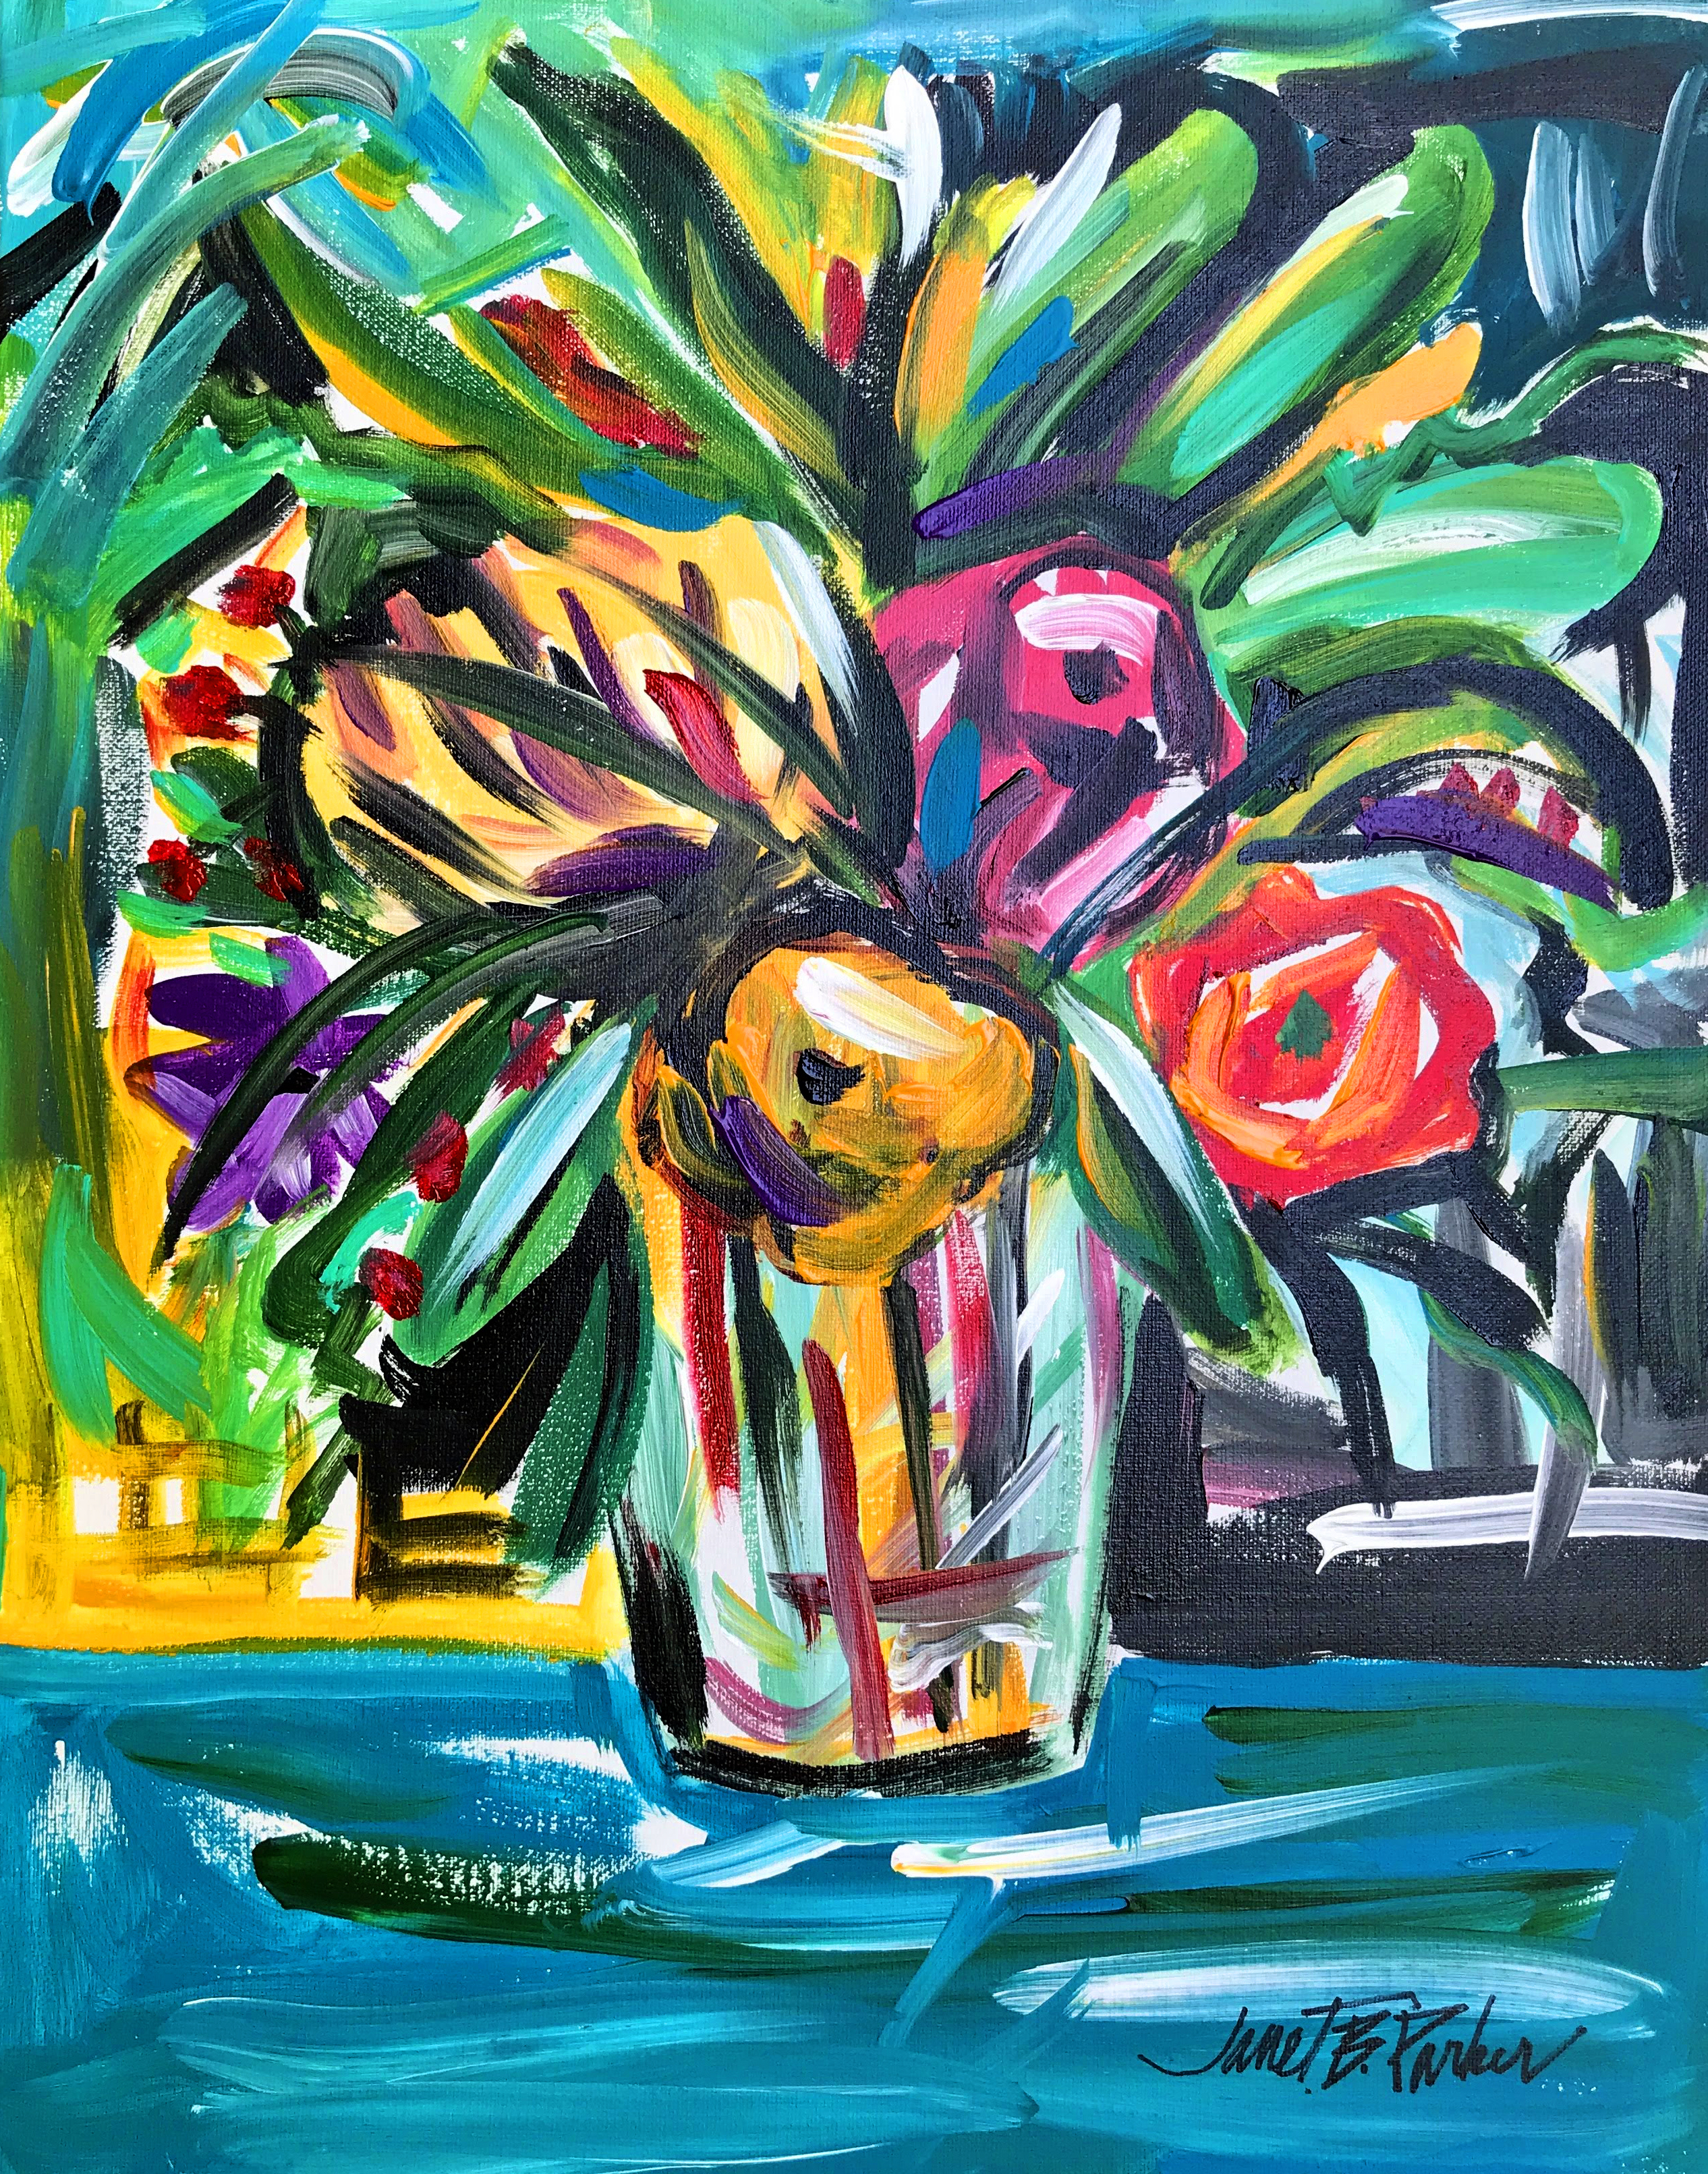 Jaron de Flores